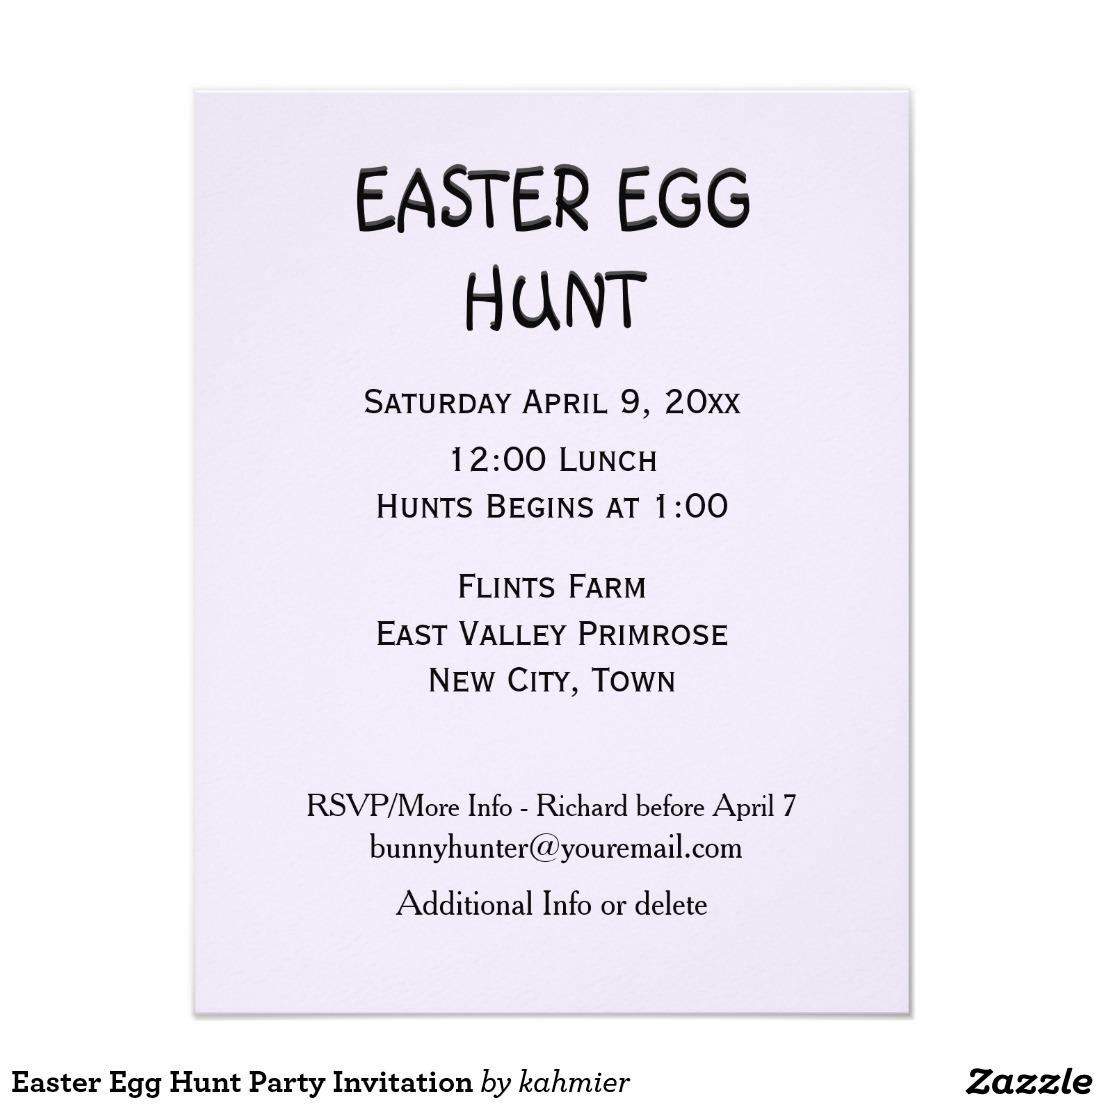 Easter Egg Hunt Party Invitation